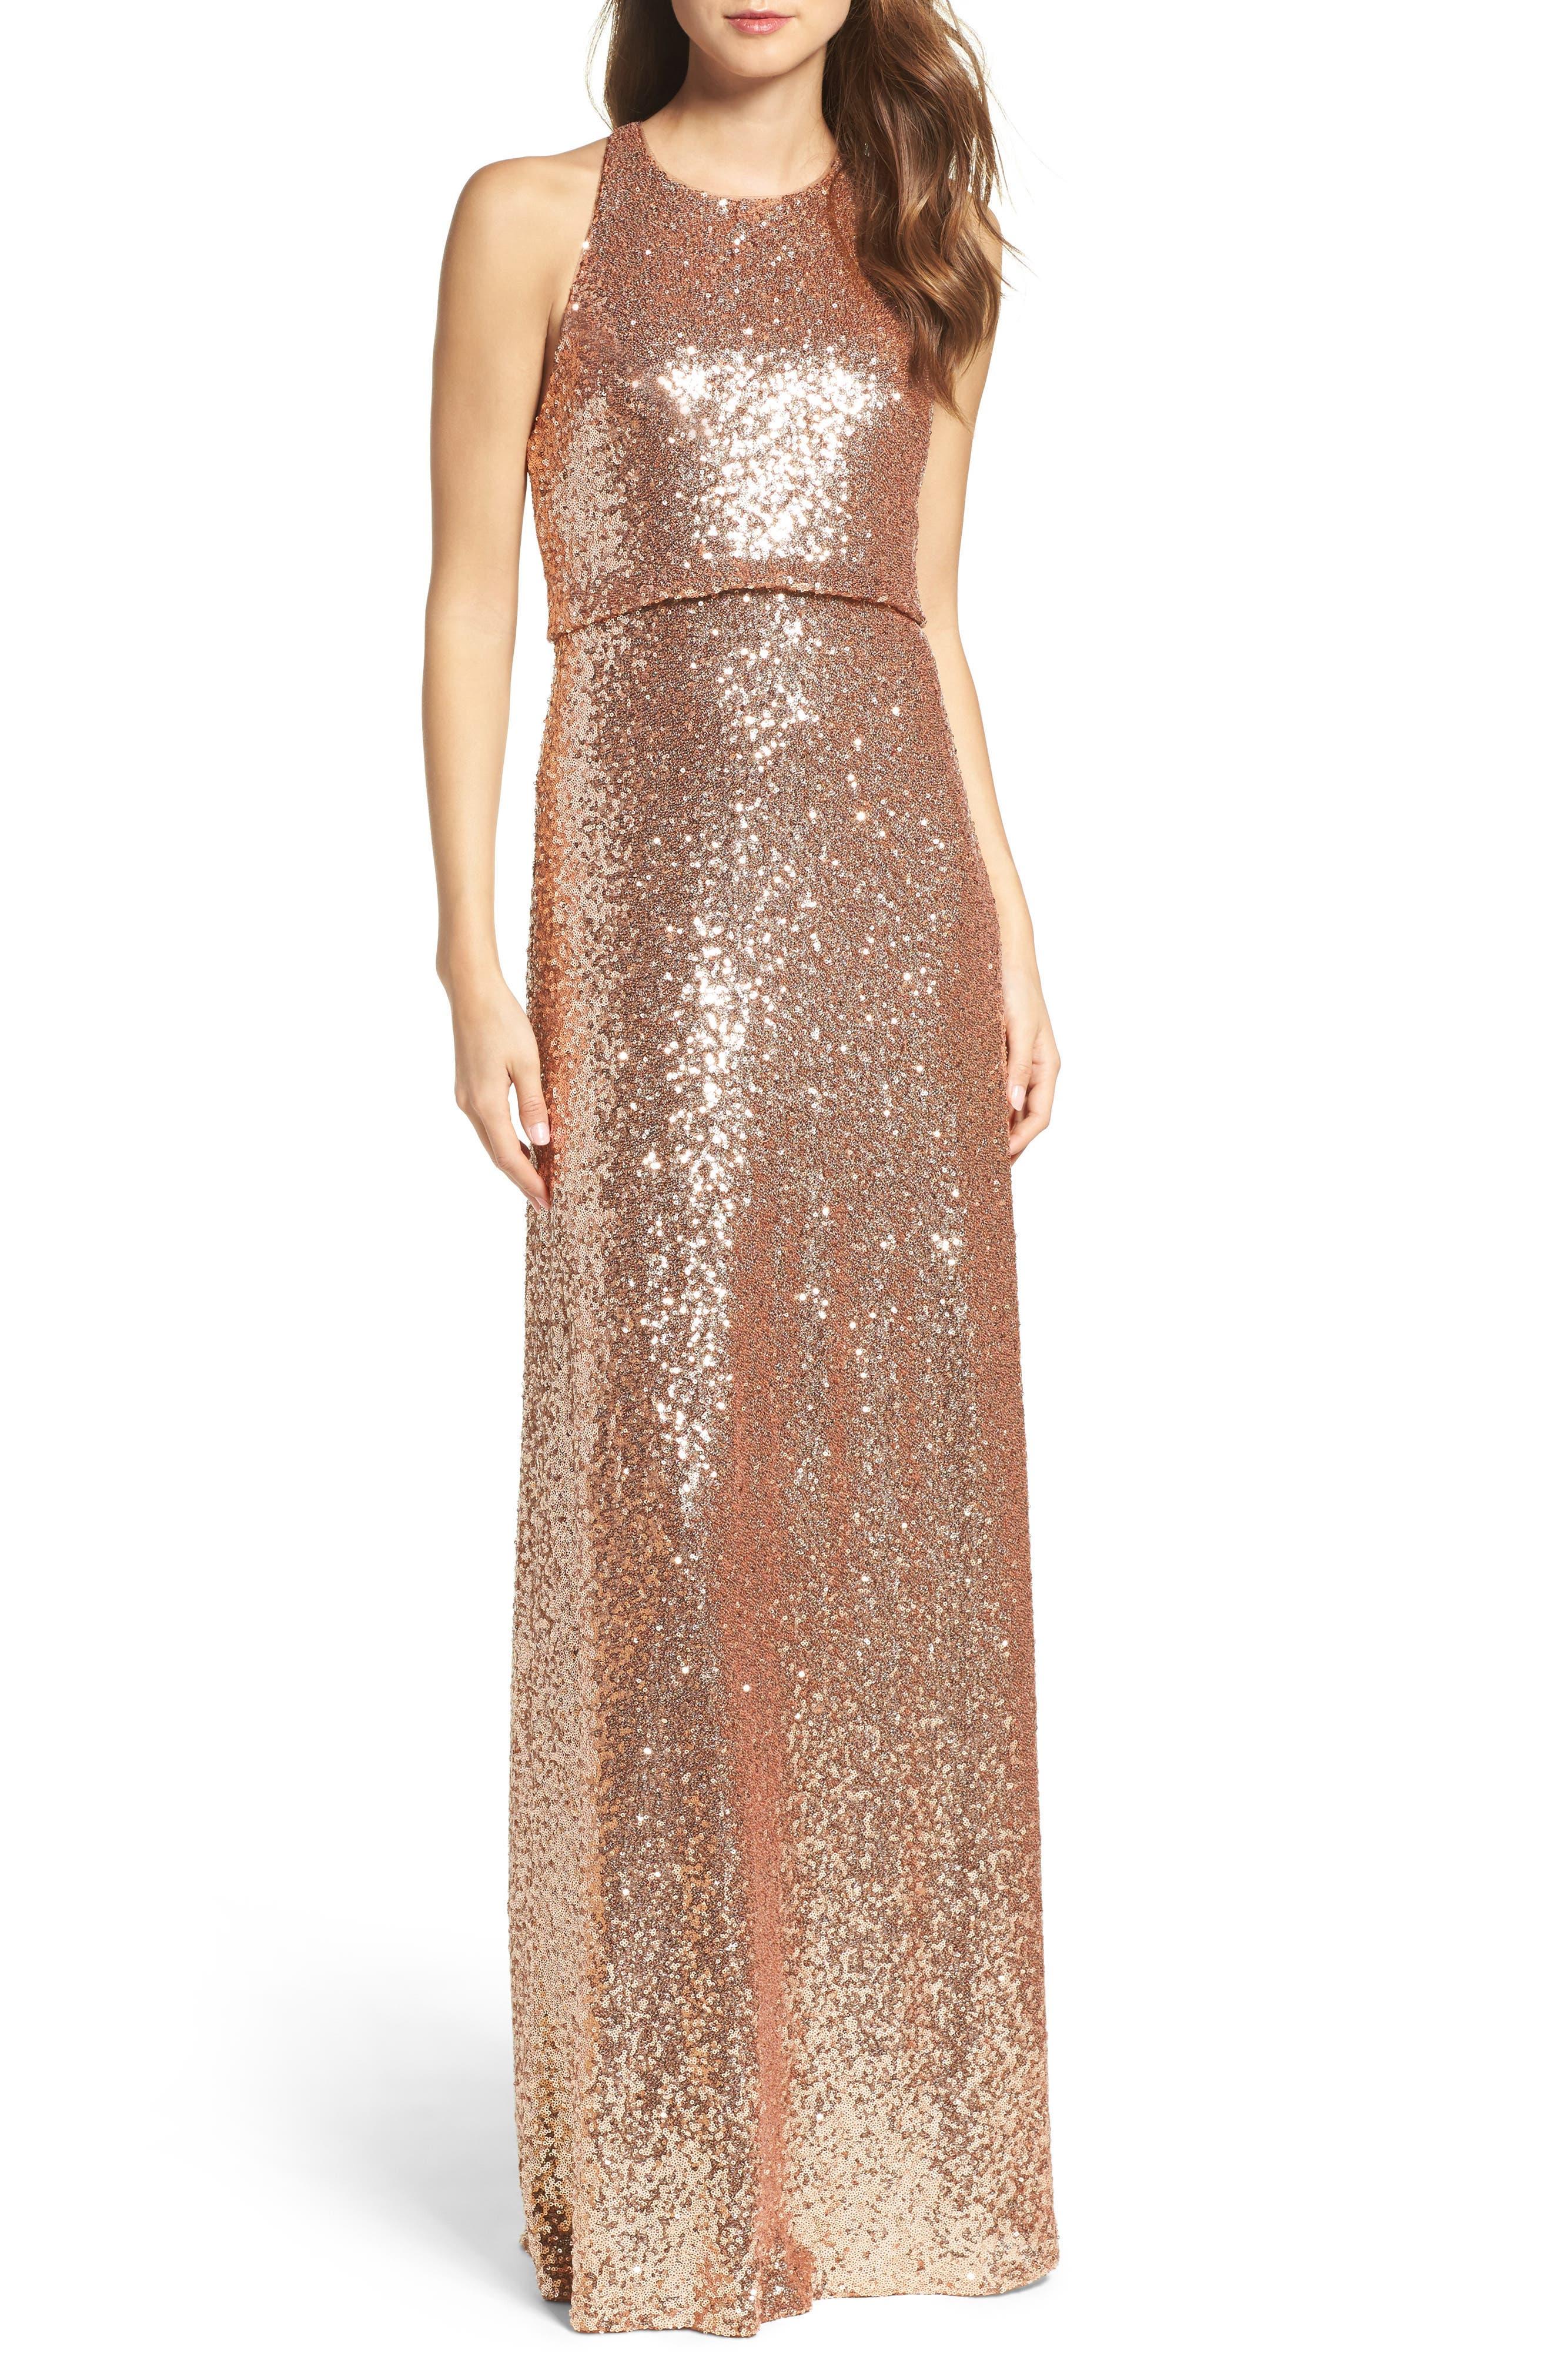 Sloane Sequin Halter Gown,                         Main,                         color, Rose Gold